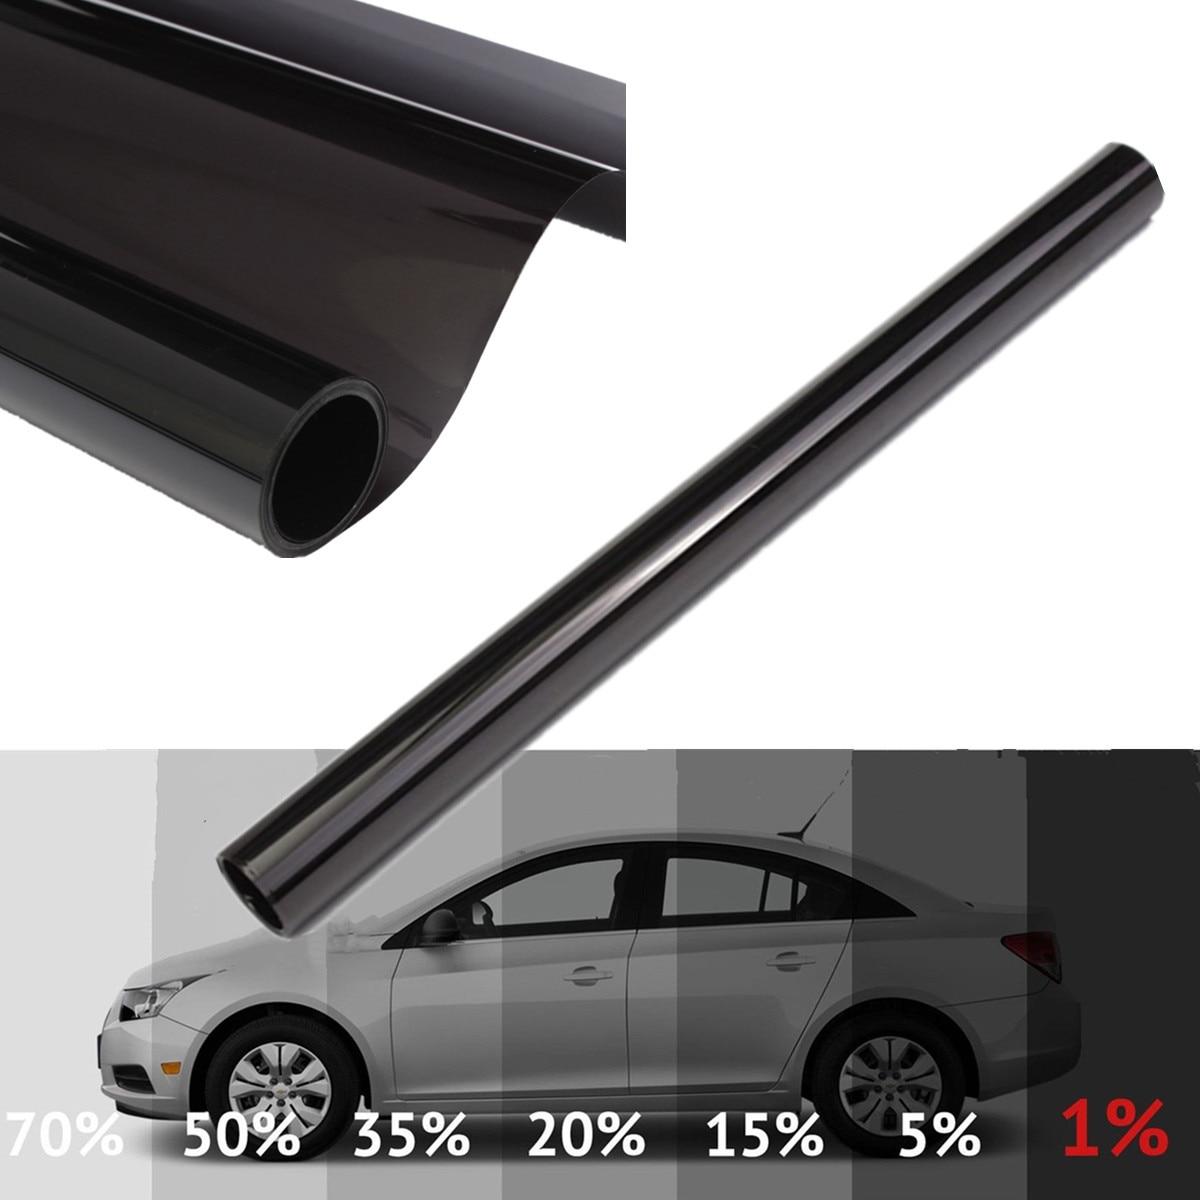 Uncut 6m Car Window Tint Tinting Film Roll 5% 15% 30% 50% VLT UV Insulation Auto Home Window Glass Solar UV Protector Stickers